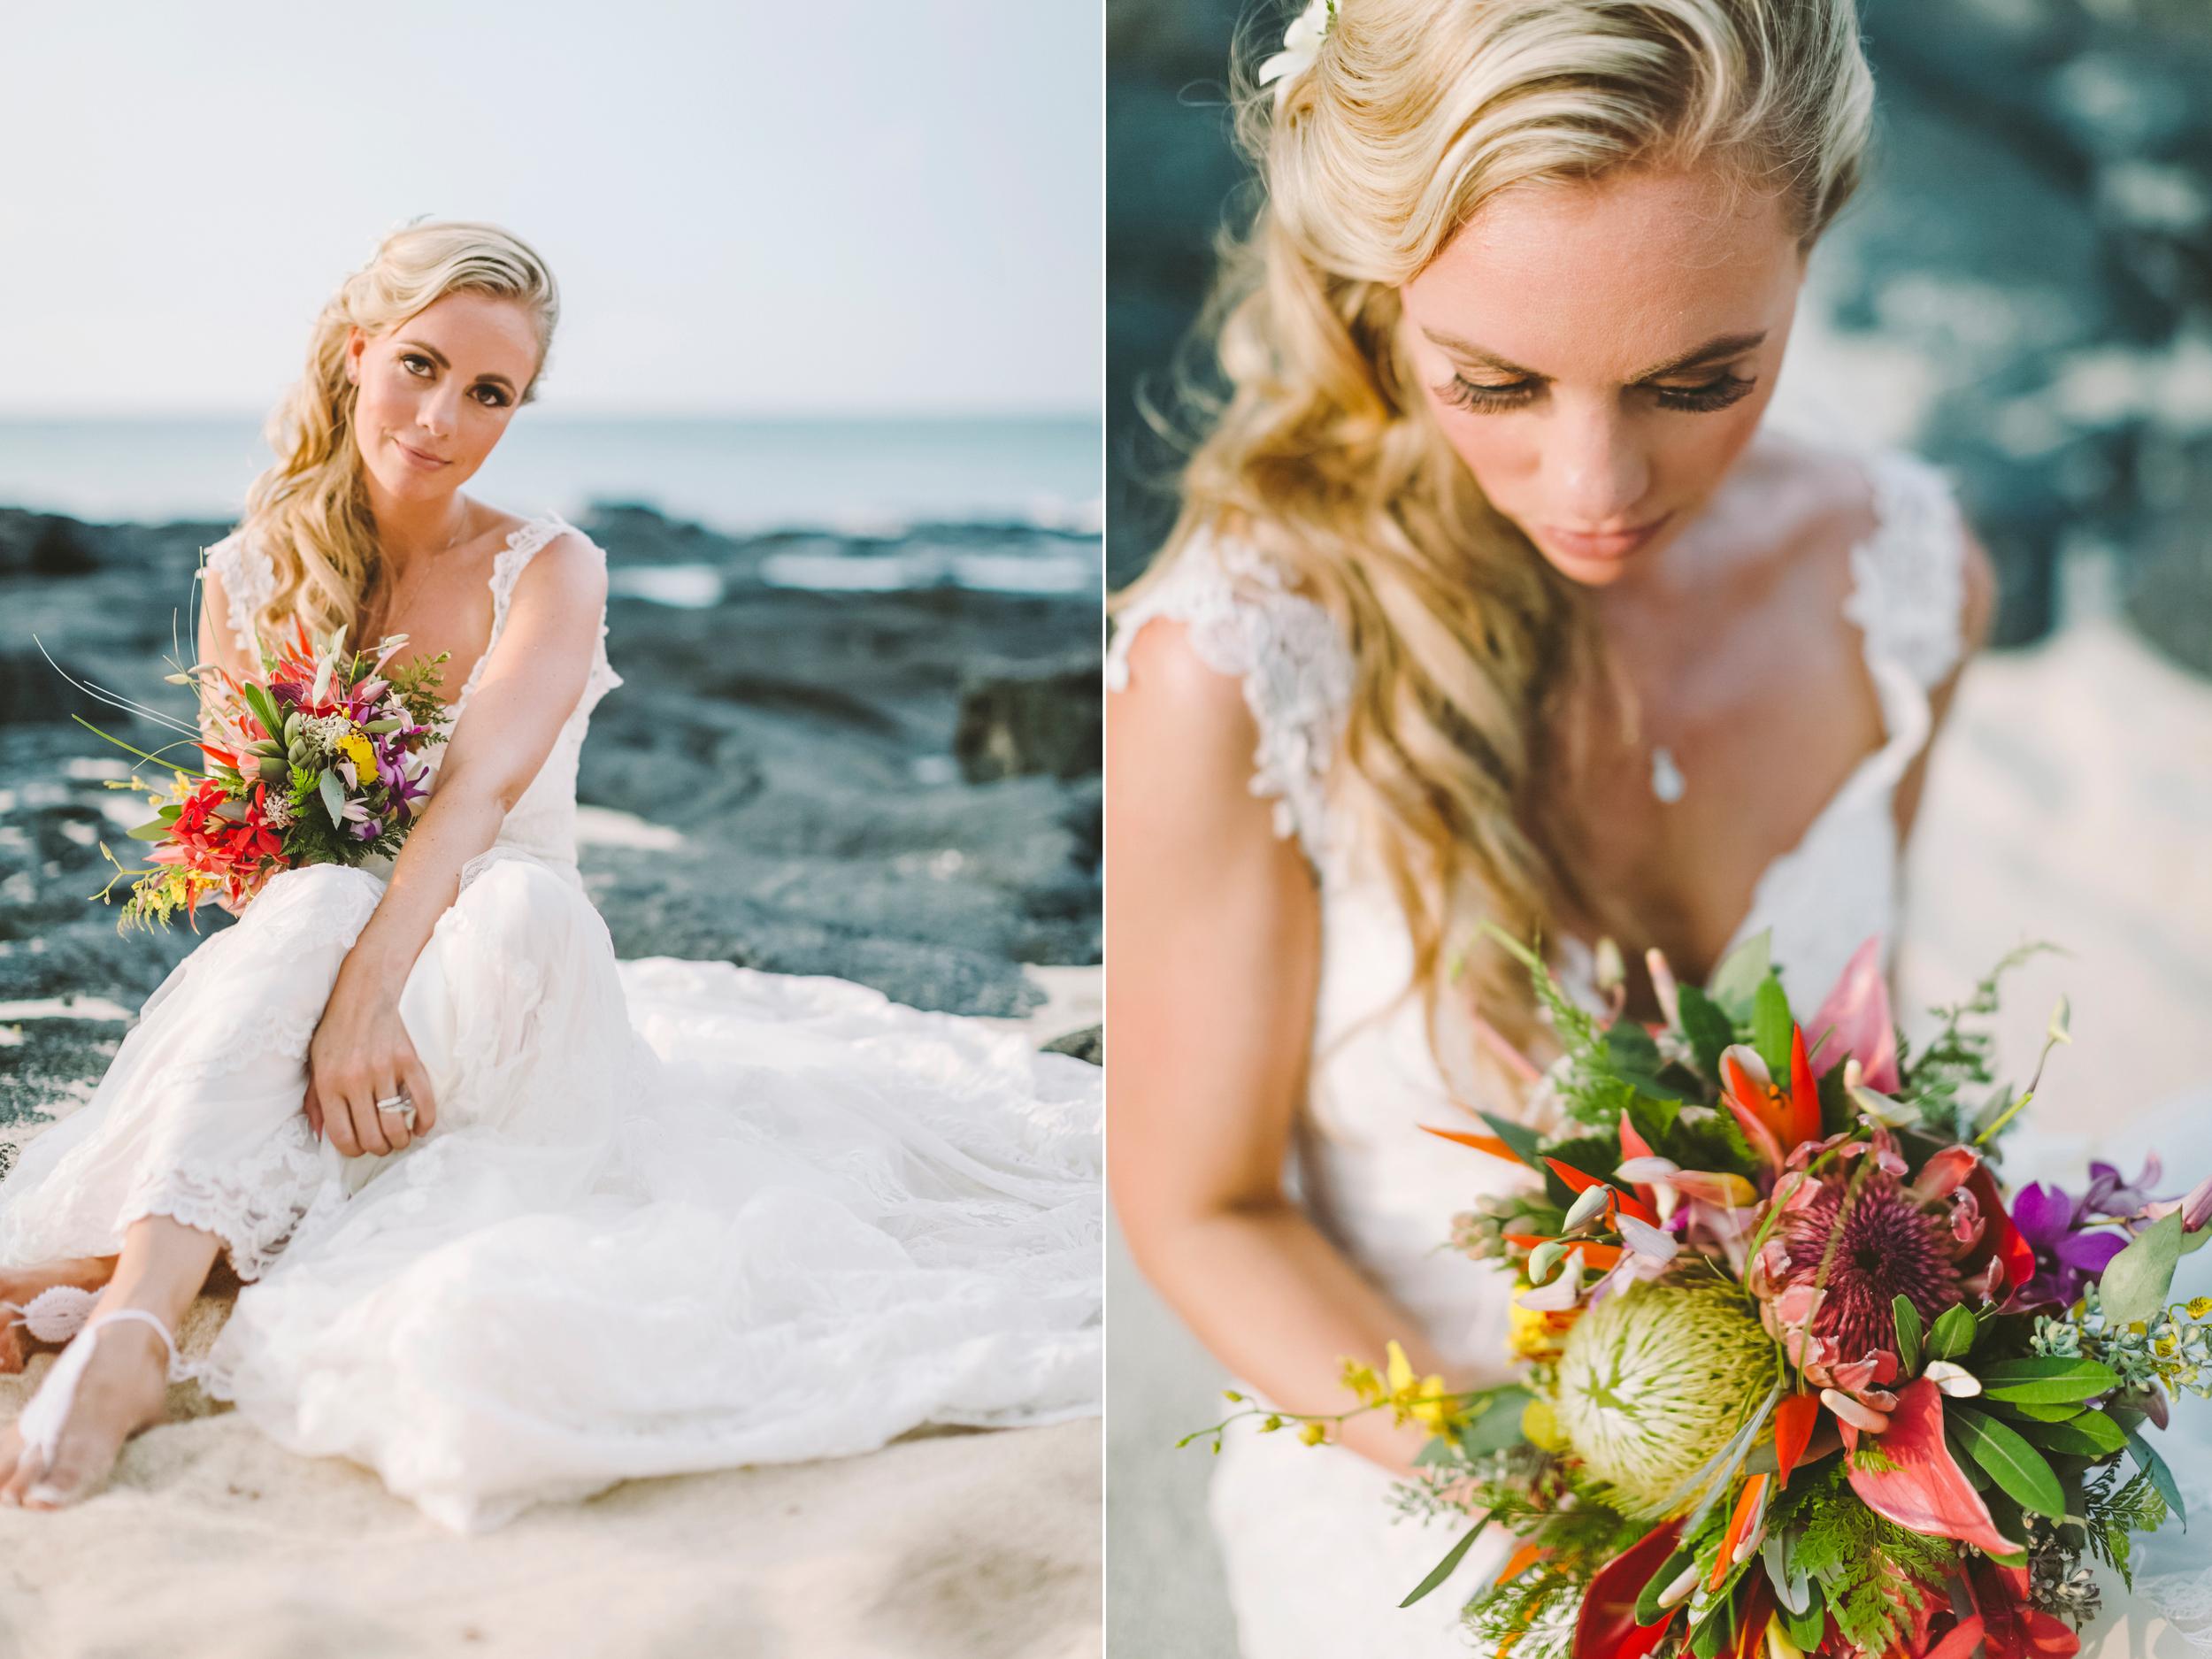 angie-diaz-photography-hawaii-wedding-photographer-kelli-jay-90.jpg